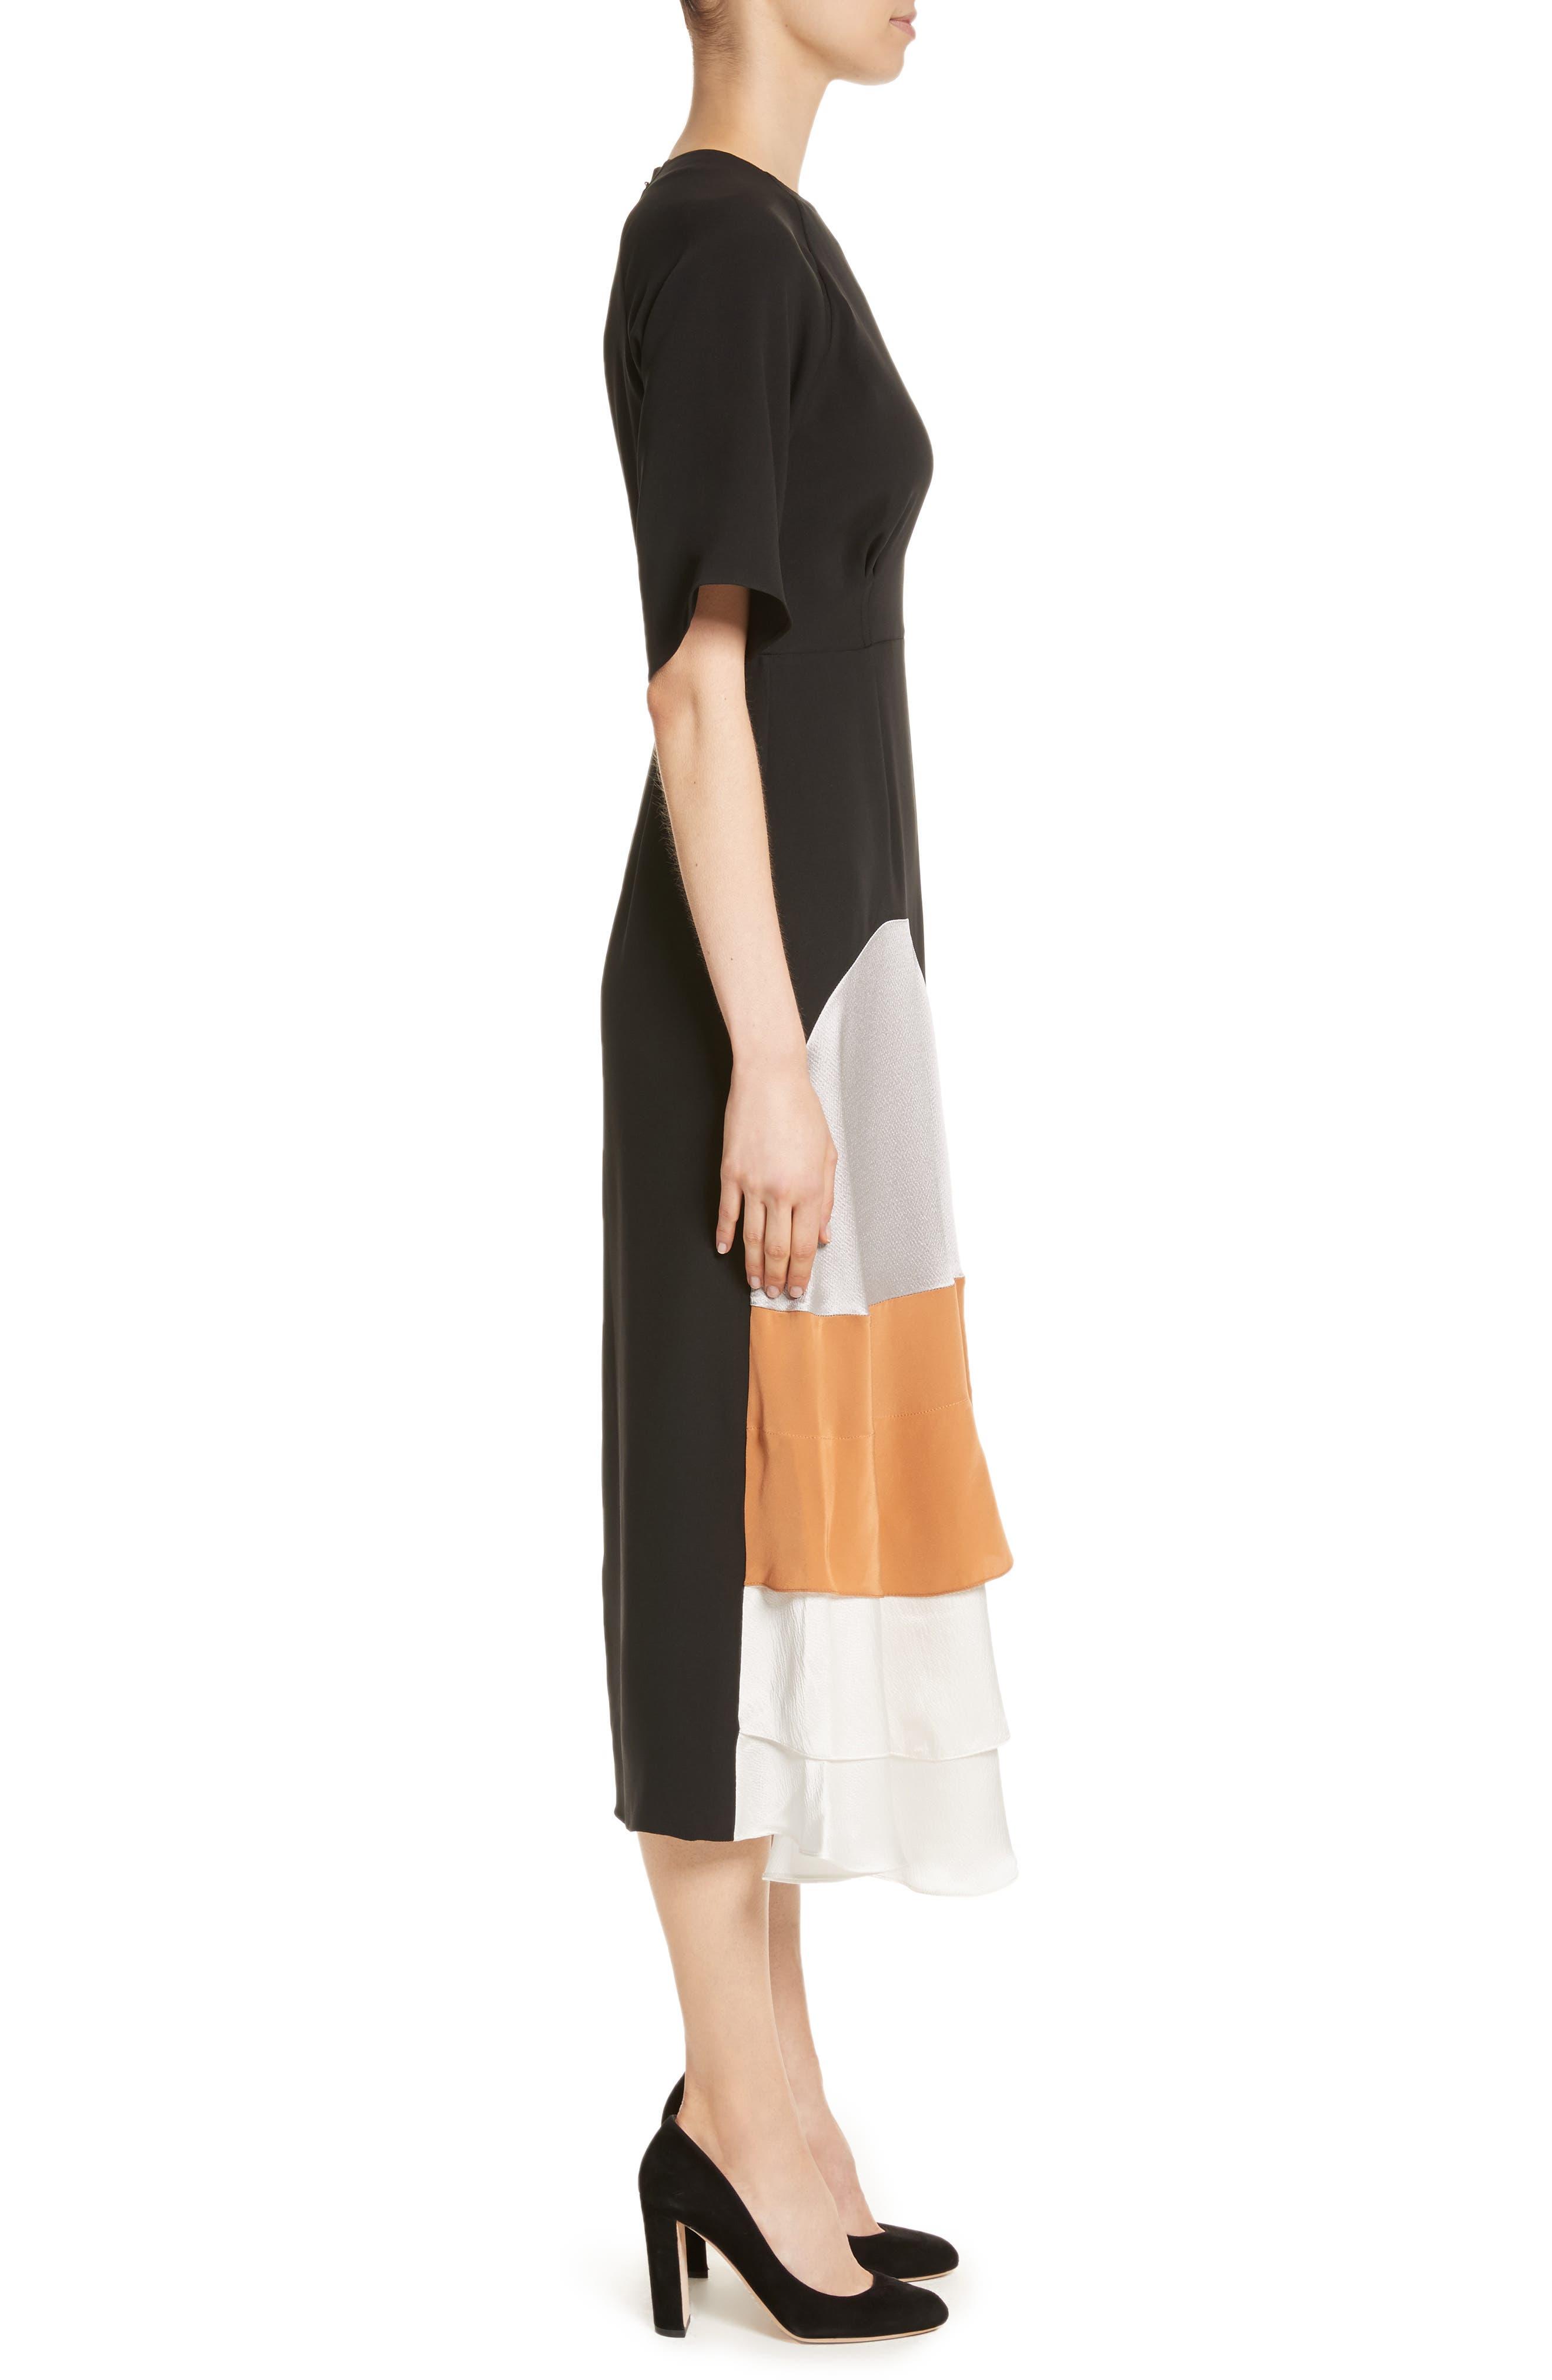 Rauma Silk Dress,                             Alternate thumbnail 3, color,                             Black/ Silver/ Sand/ Ivory